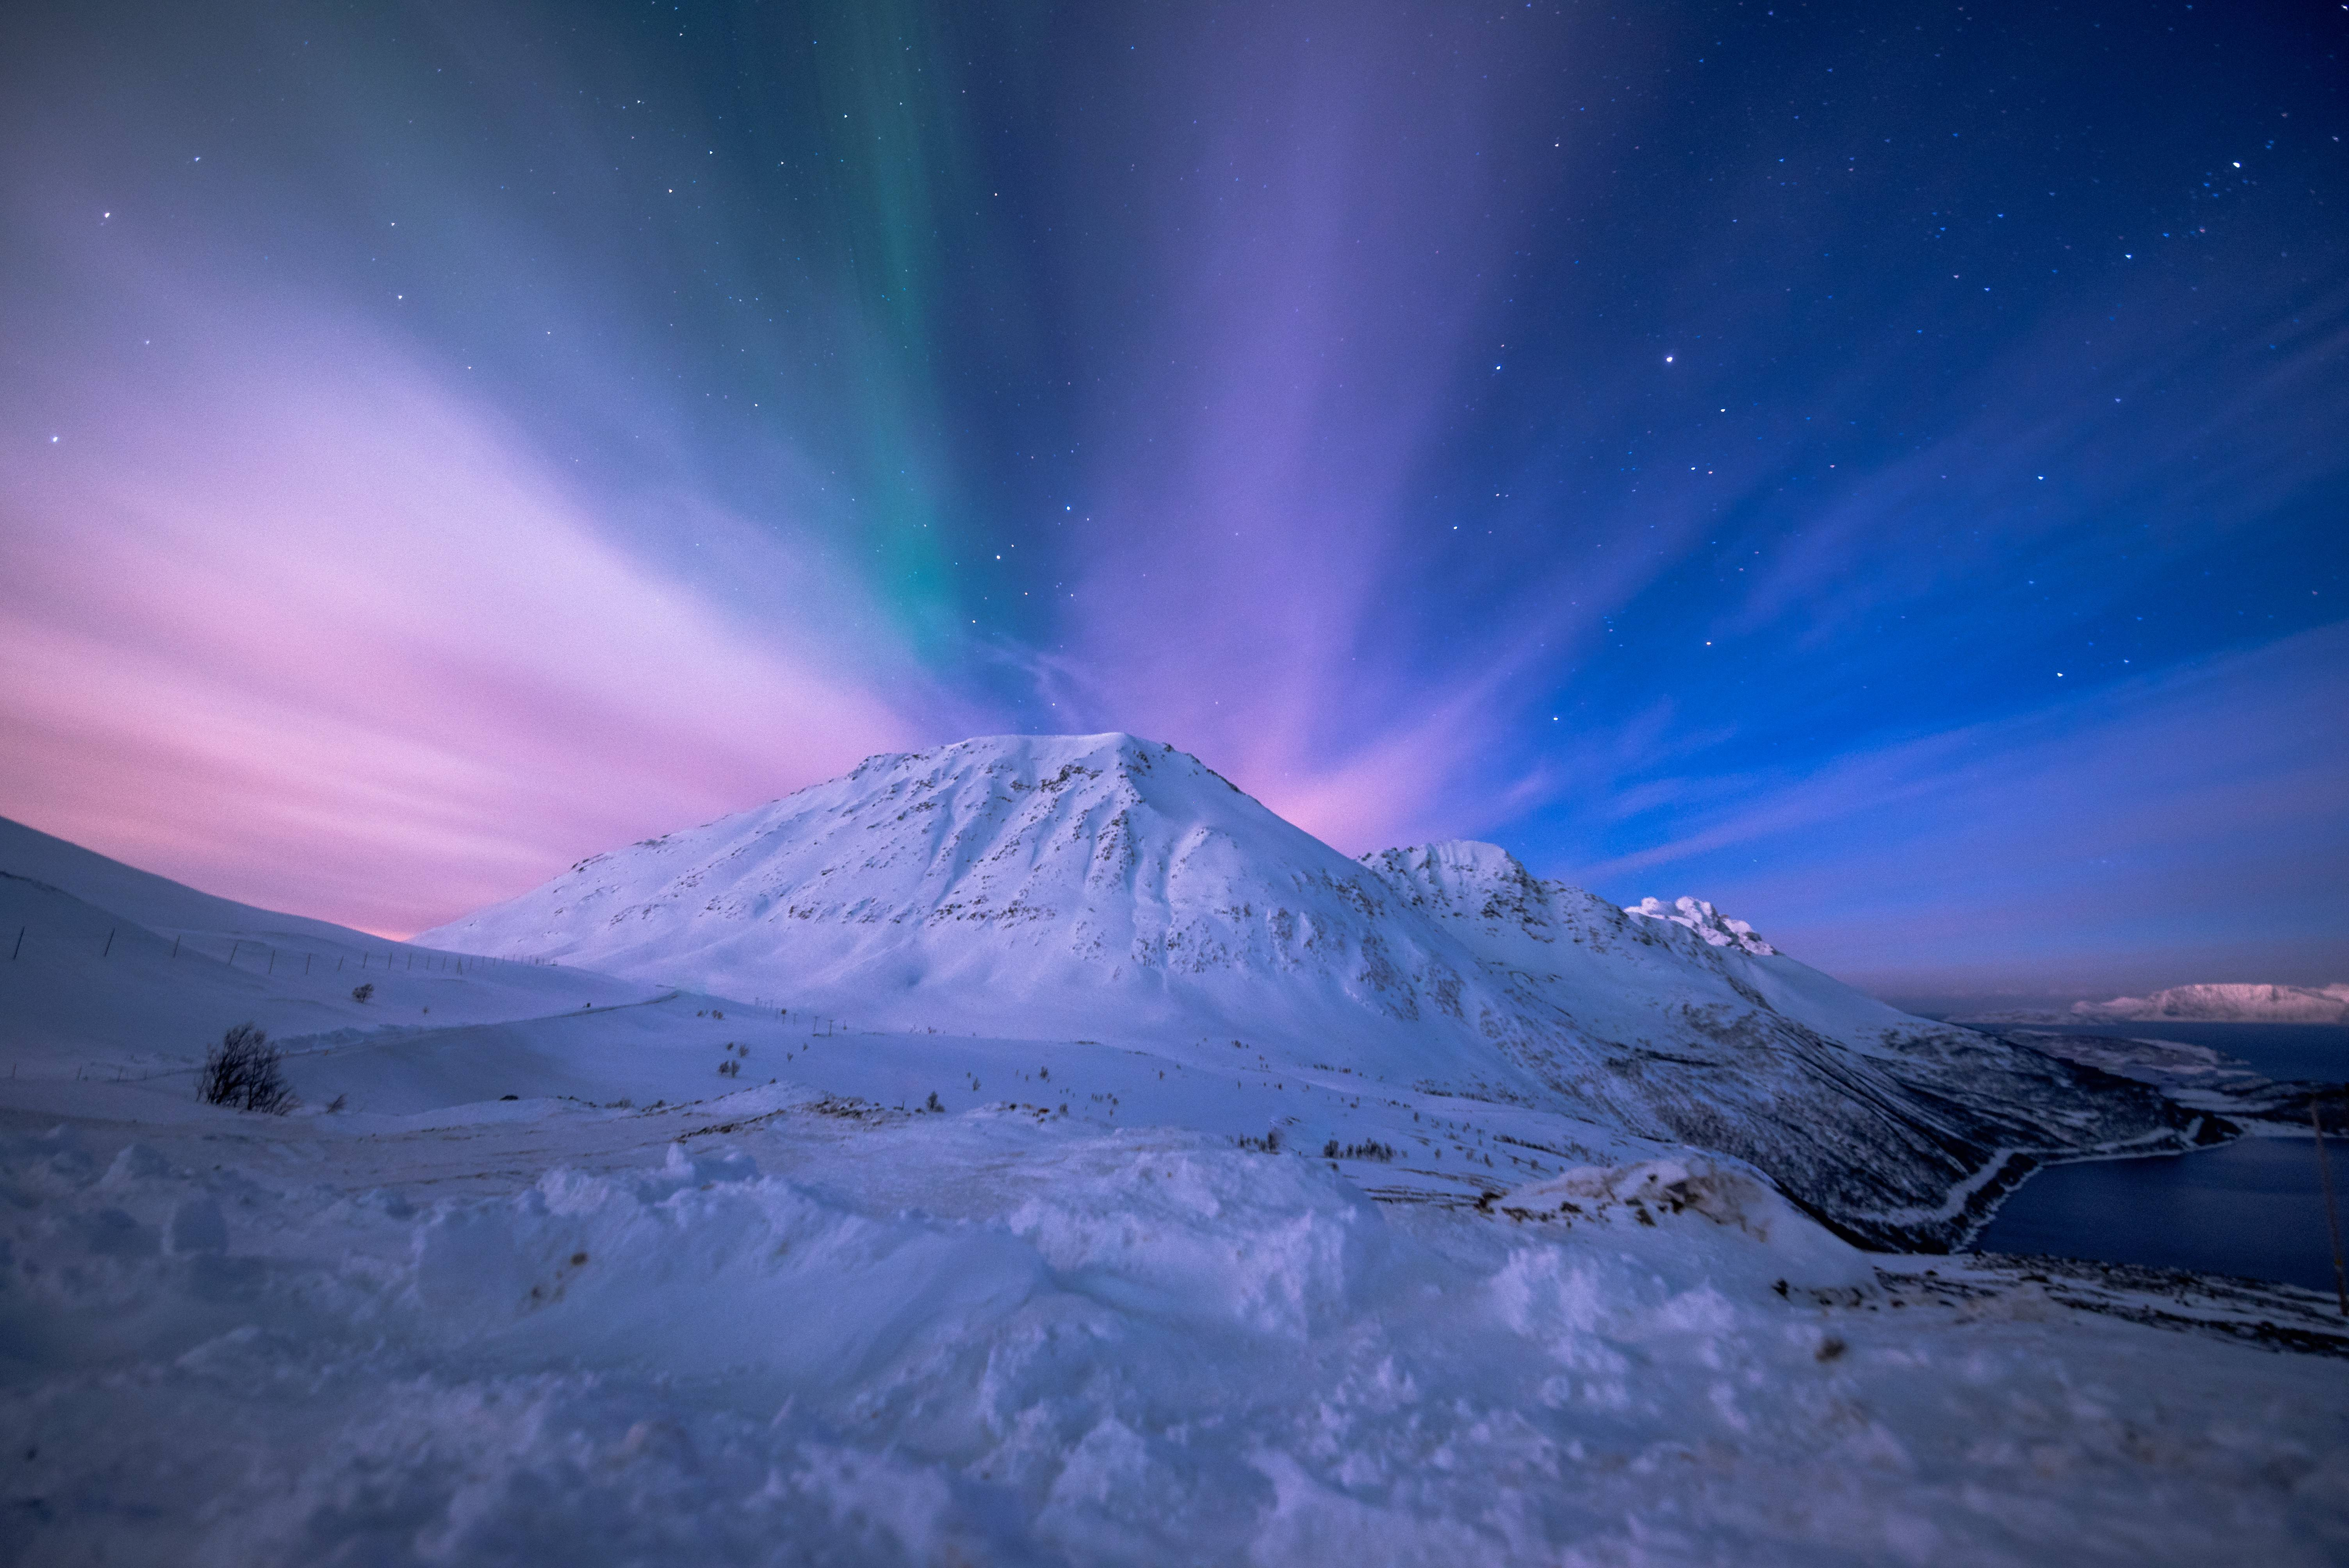 обои Норвегия, горы, ночь, сияние картинки фото